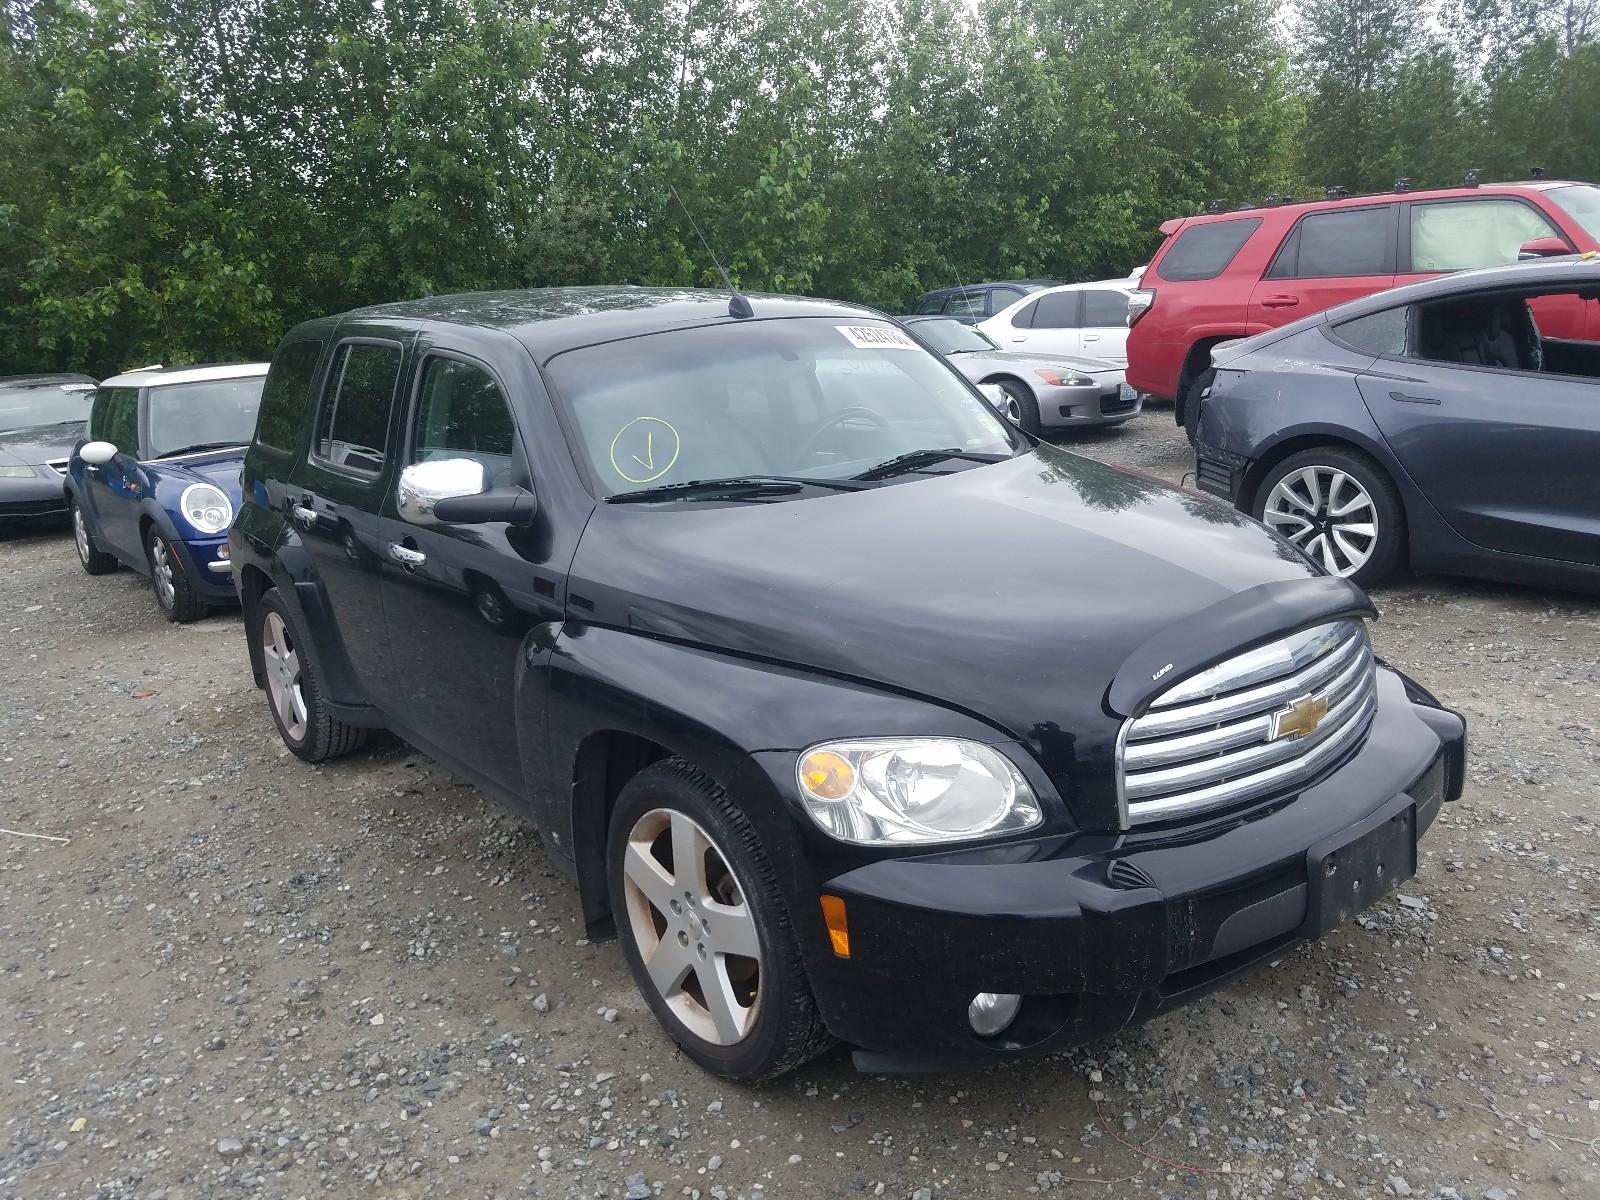 2007 Chevrolet Hhr Lt For Sale At Copart Arlington Wa Lot